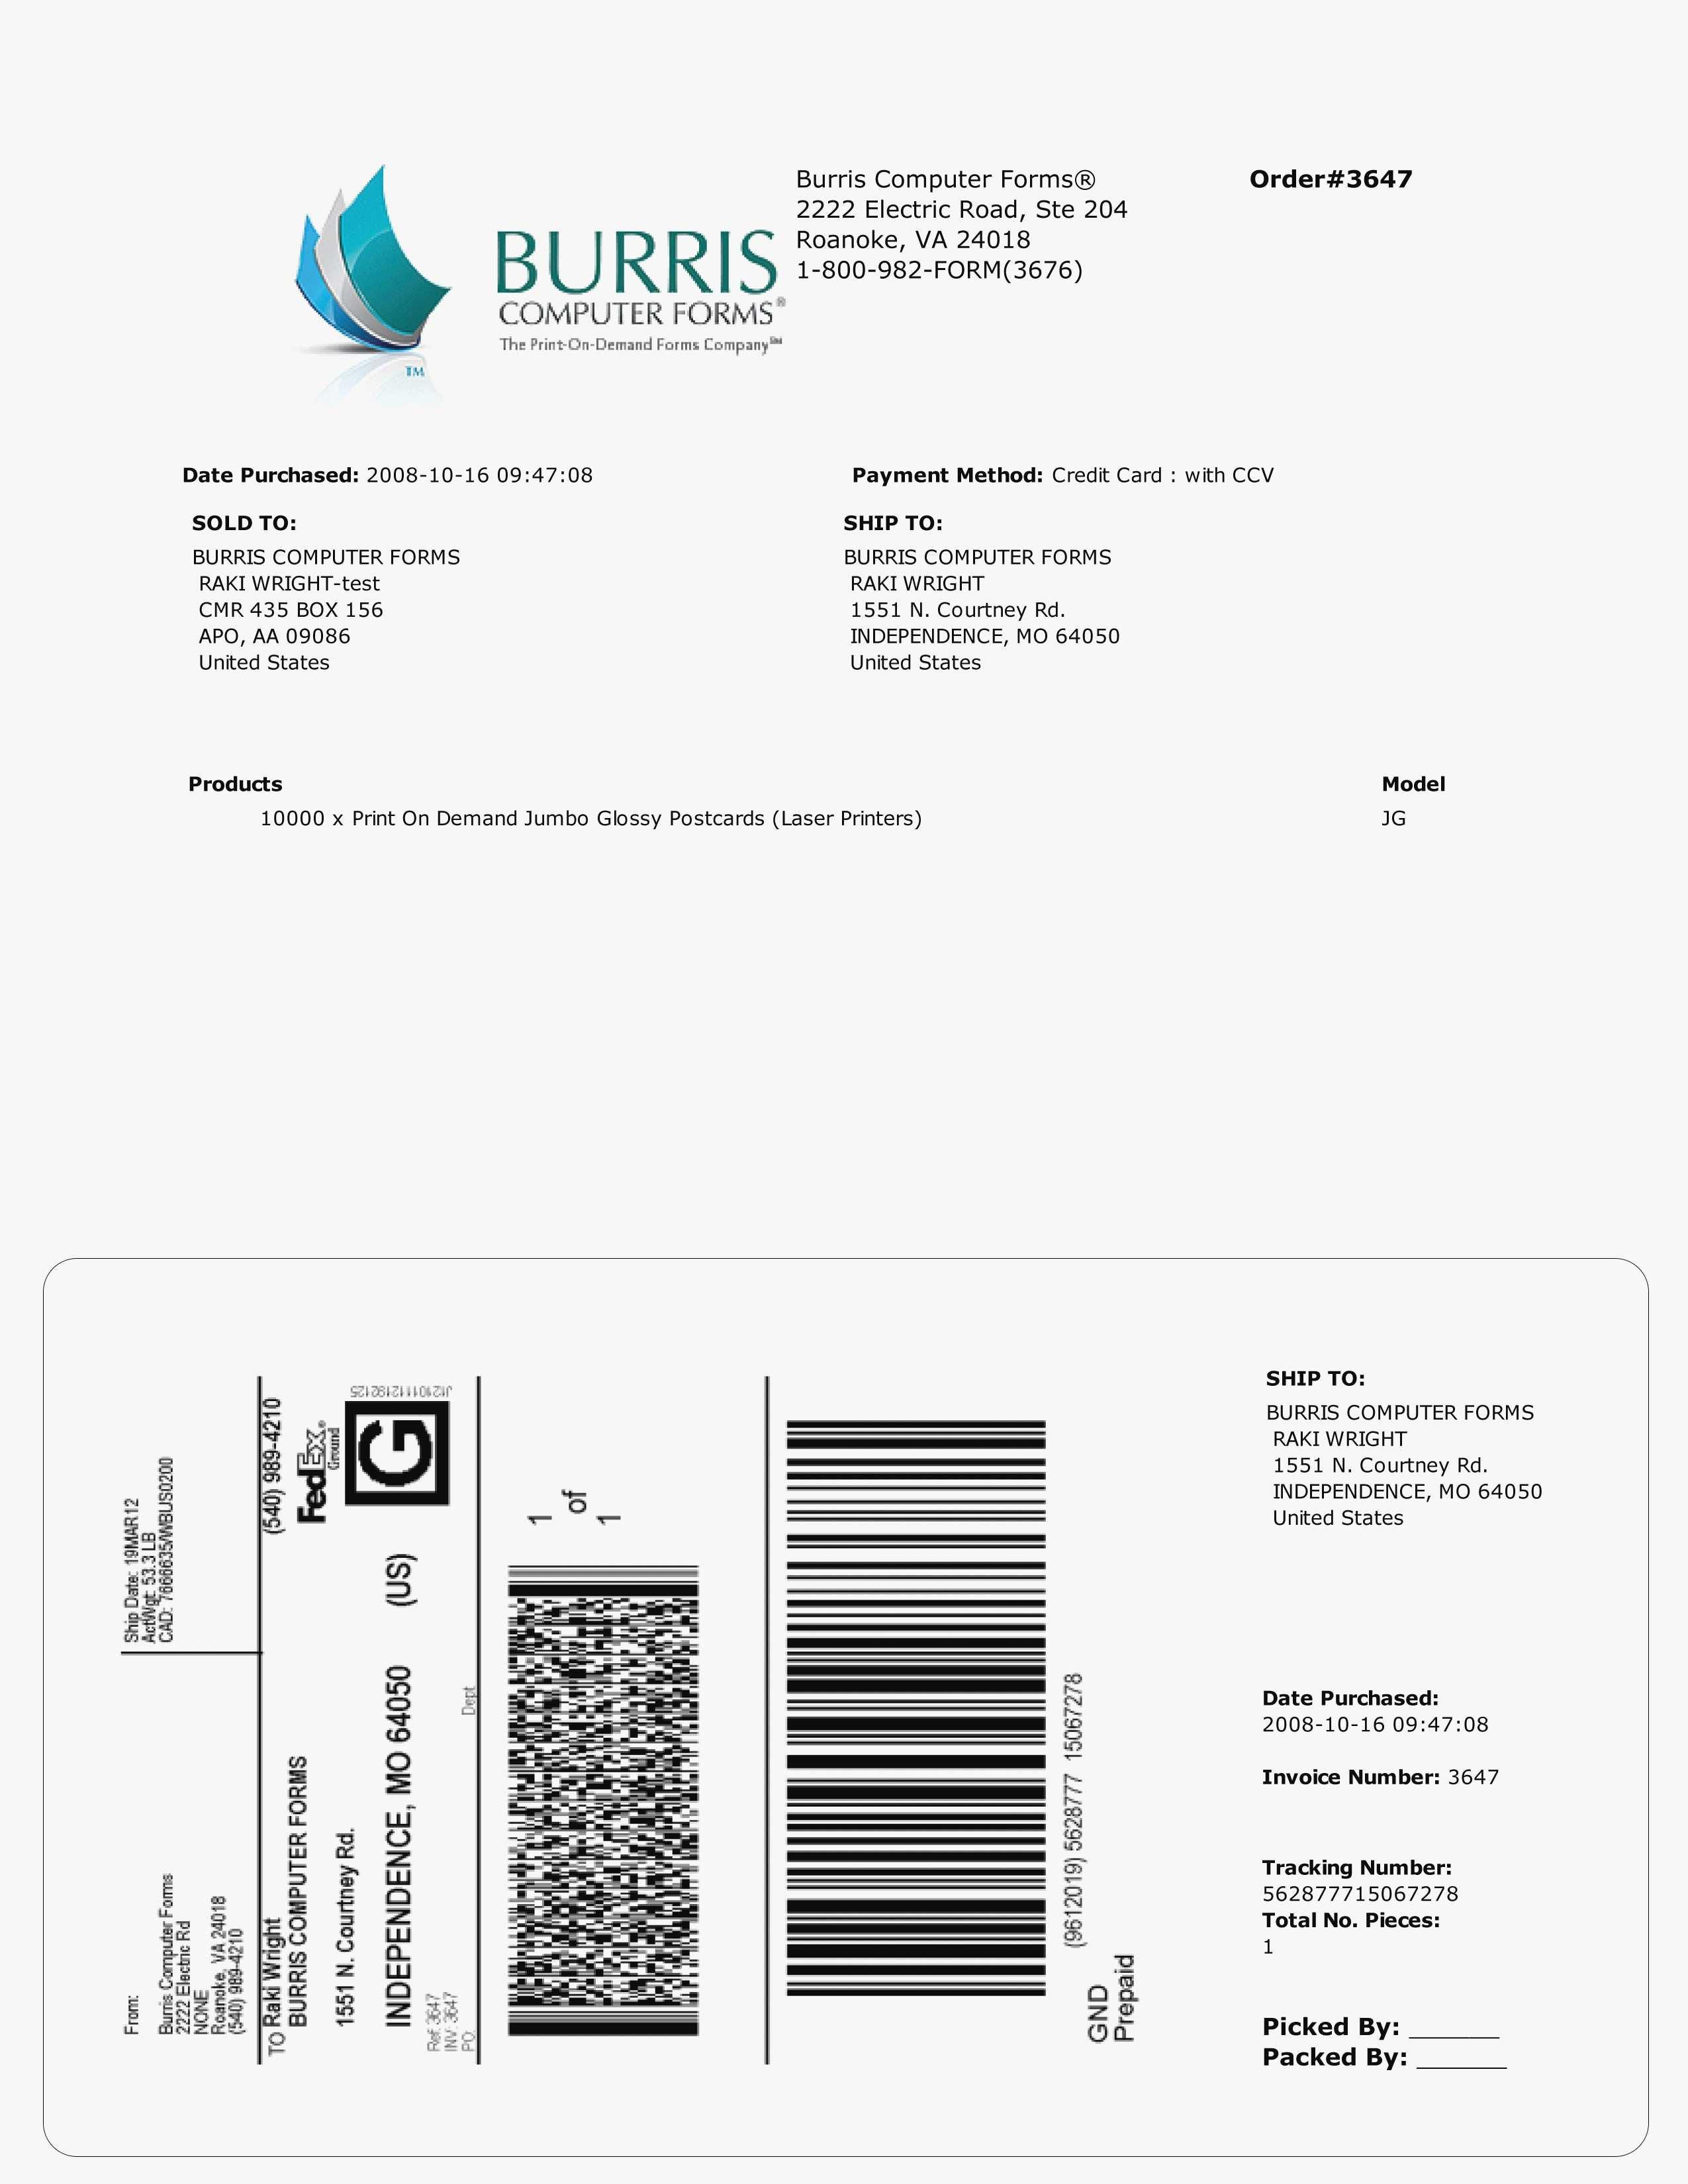 Luxury Fedex Label Printer - Acilmalumat - Free Printable Shipping Label Template